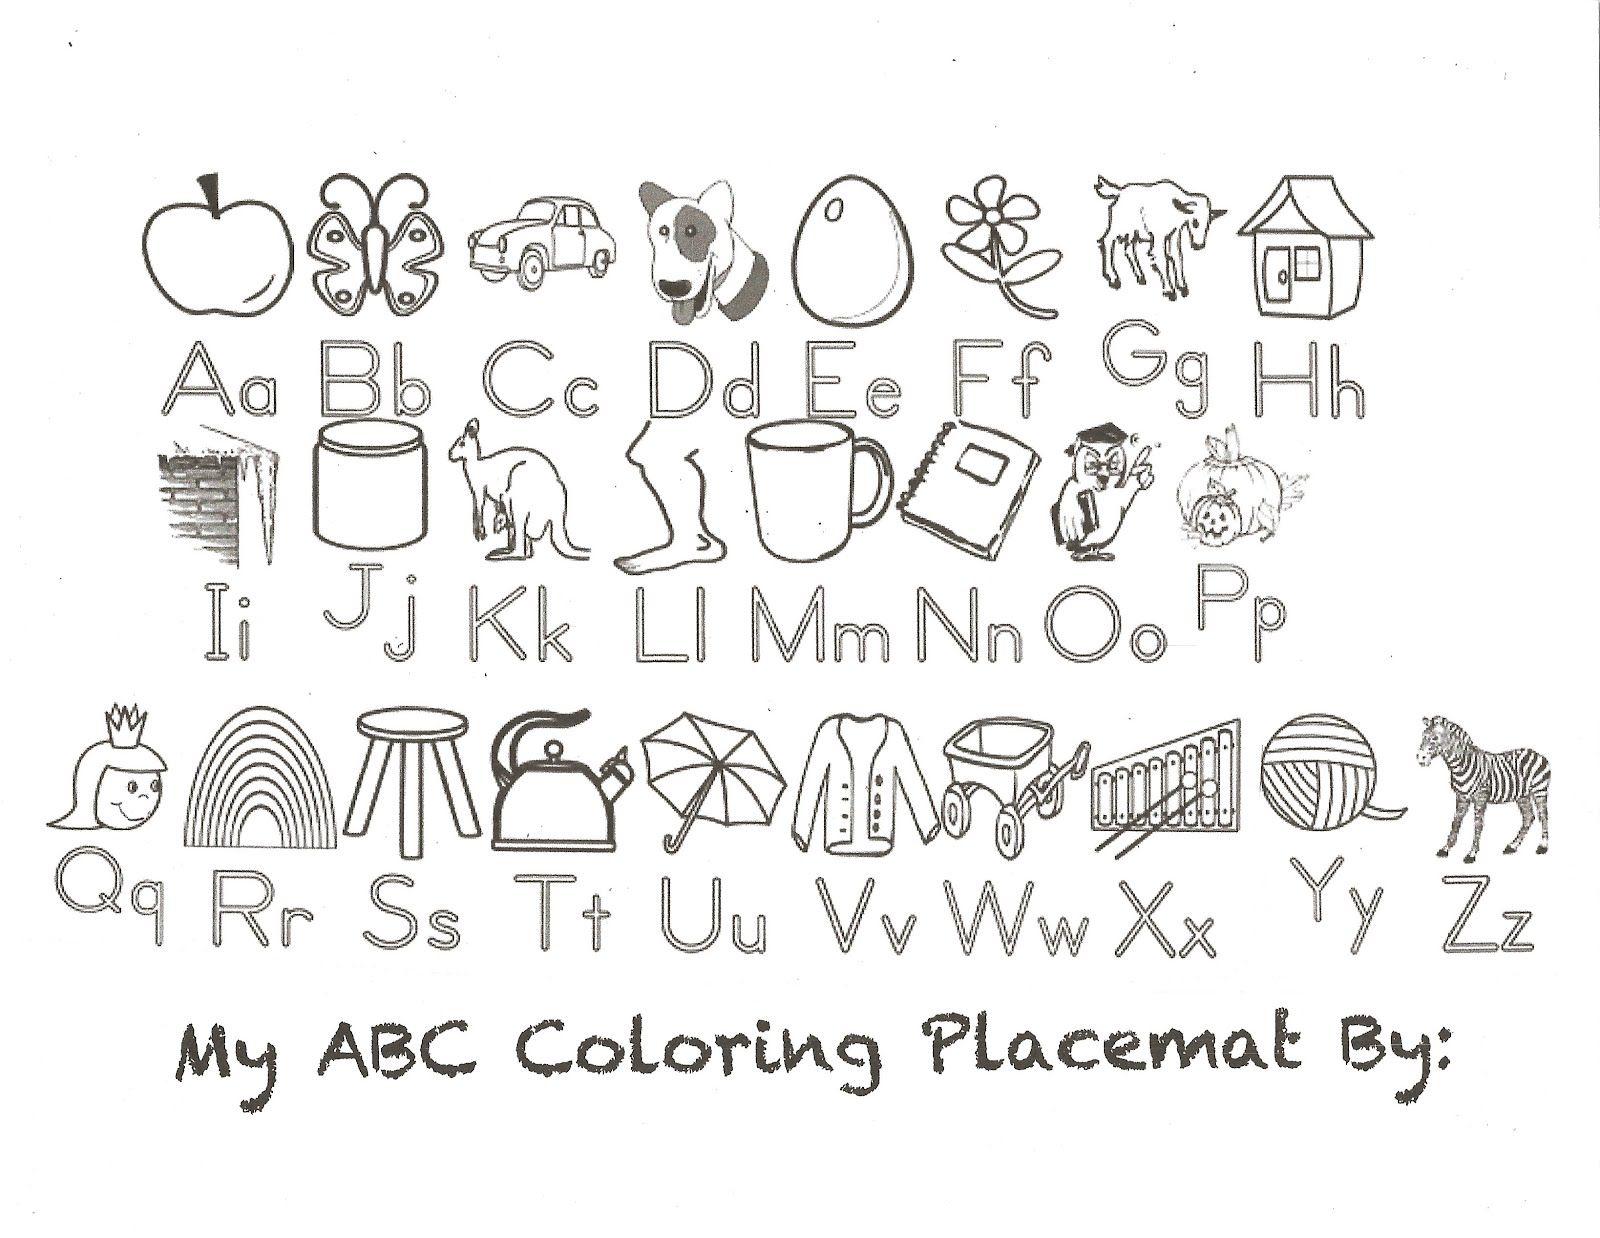 Abc Coloring Placemat